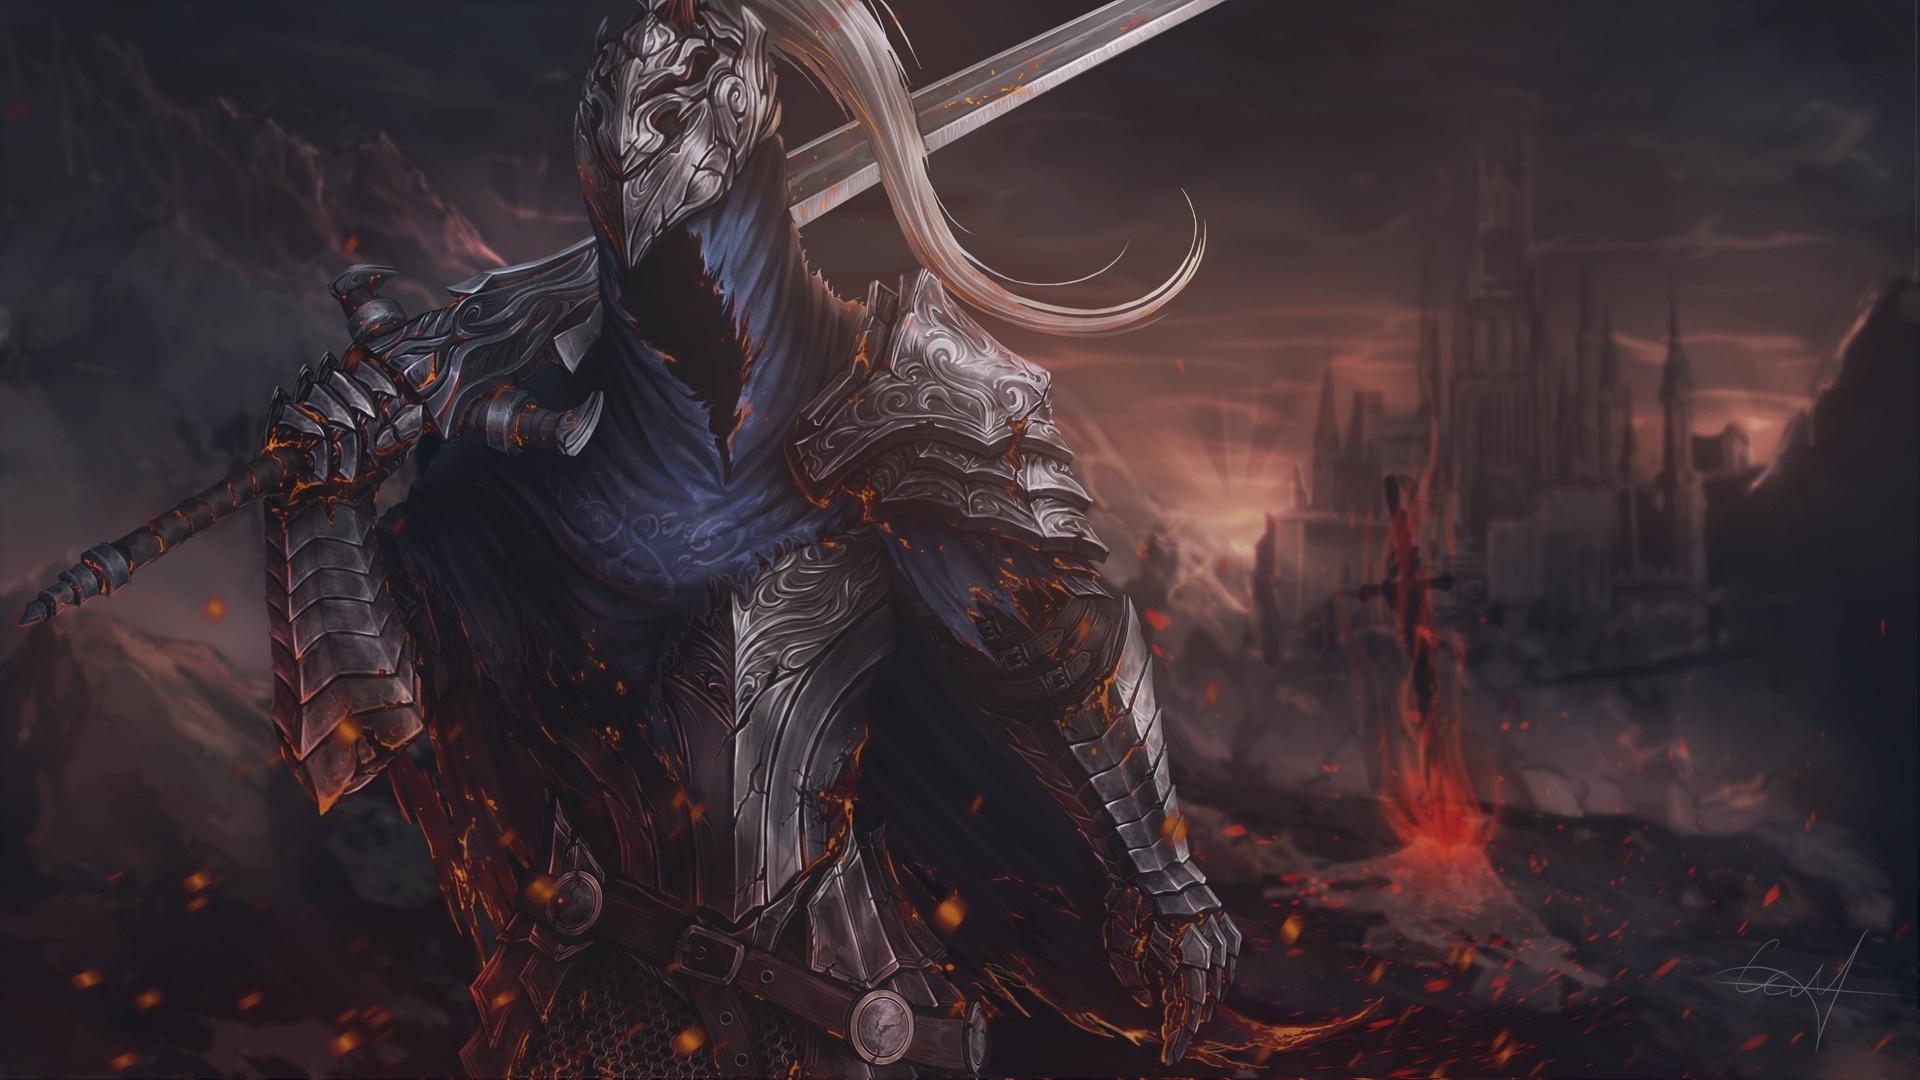 Dark Souls free background